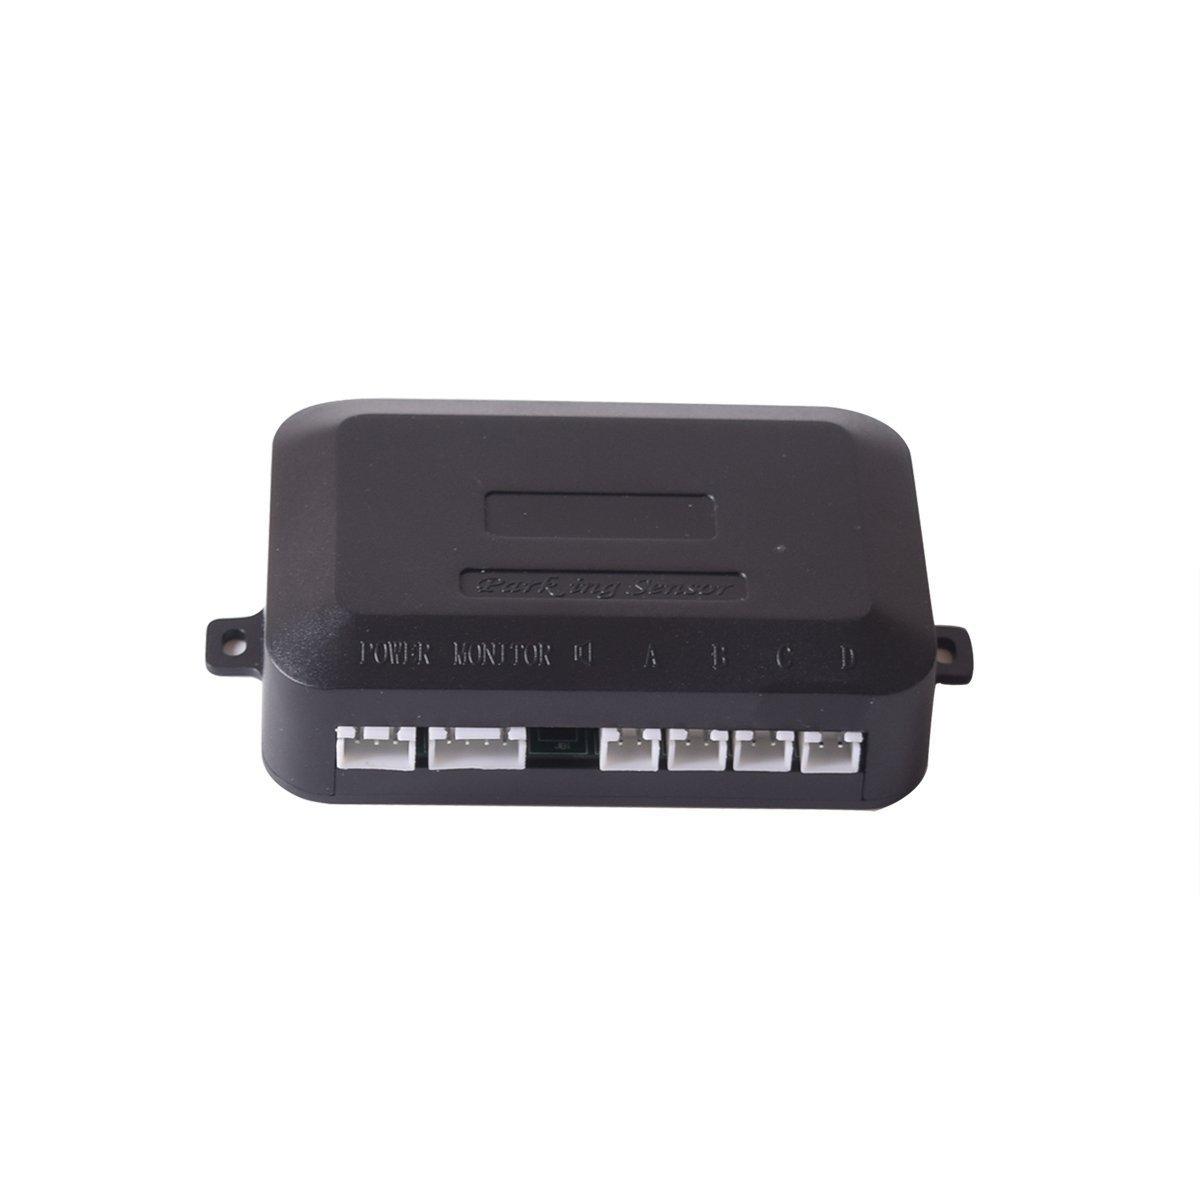 Fiat Red Color Sound Warning LED Distance Display EKYLIN Car Reverse Parking Radar System with 8 Parking Sensors Distance Detection